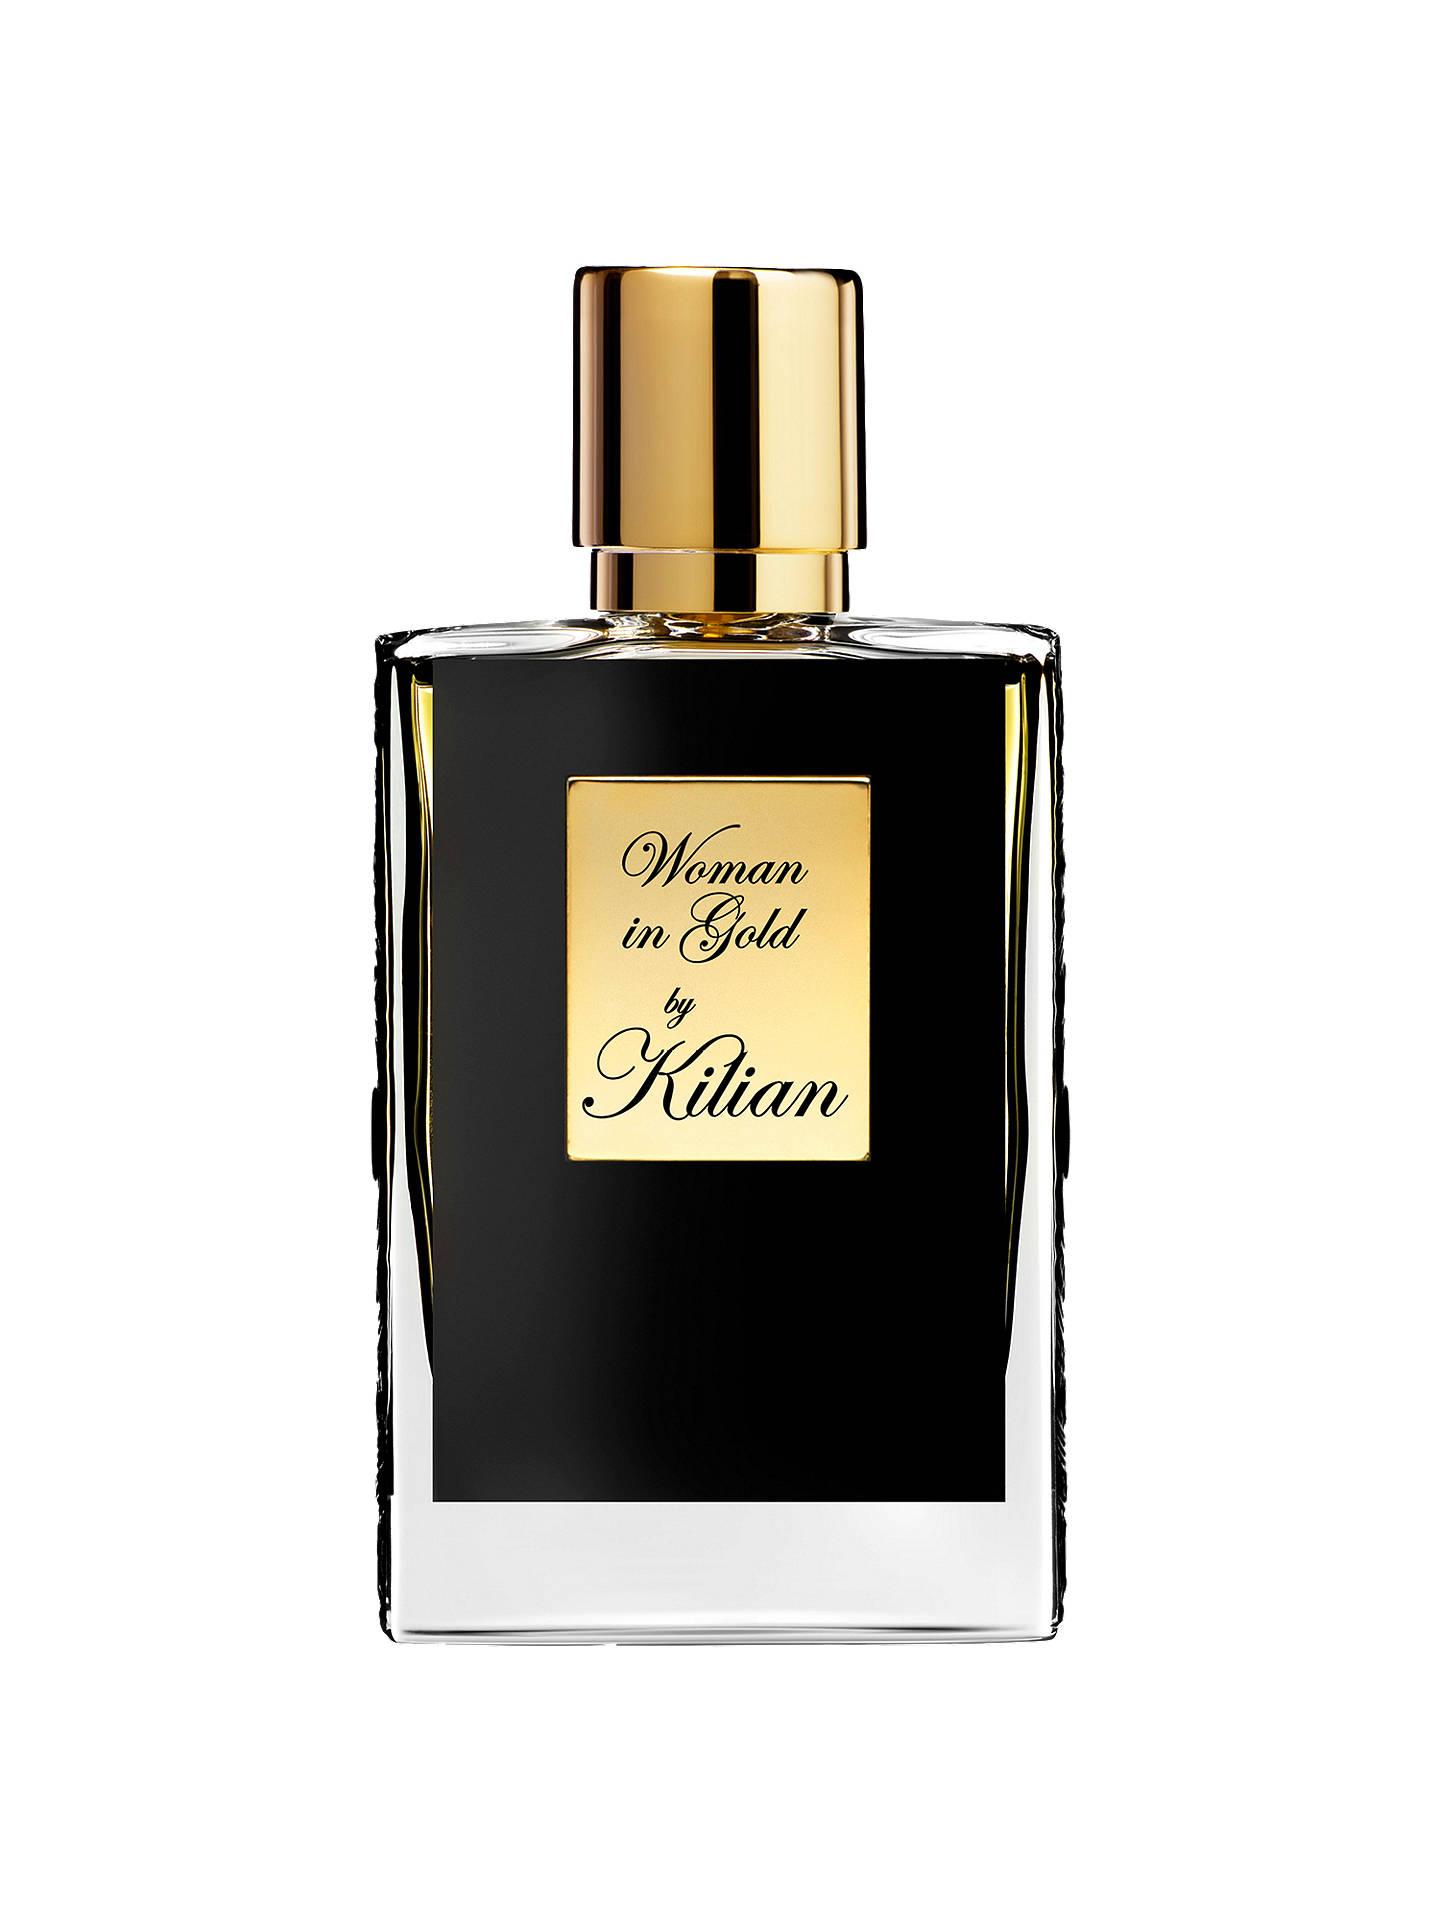 Kilian Woman In Gold Eau De Parfum 50ml At John Lewis Partners